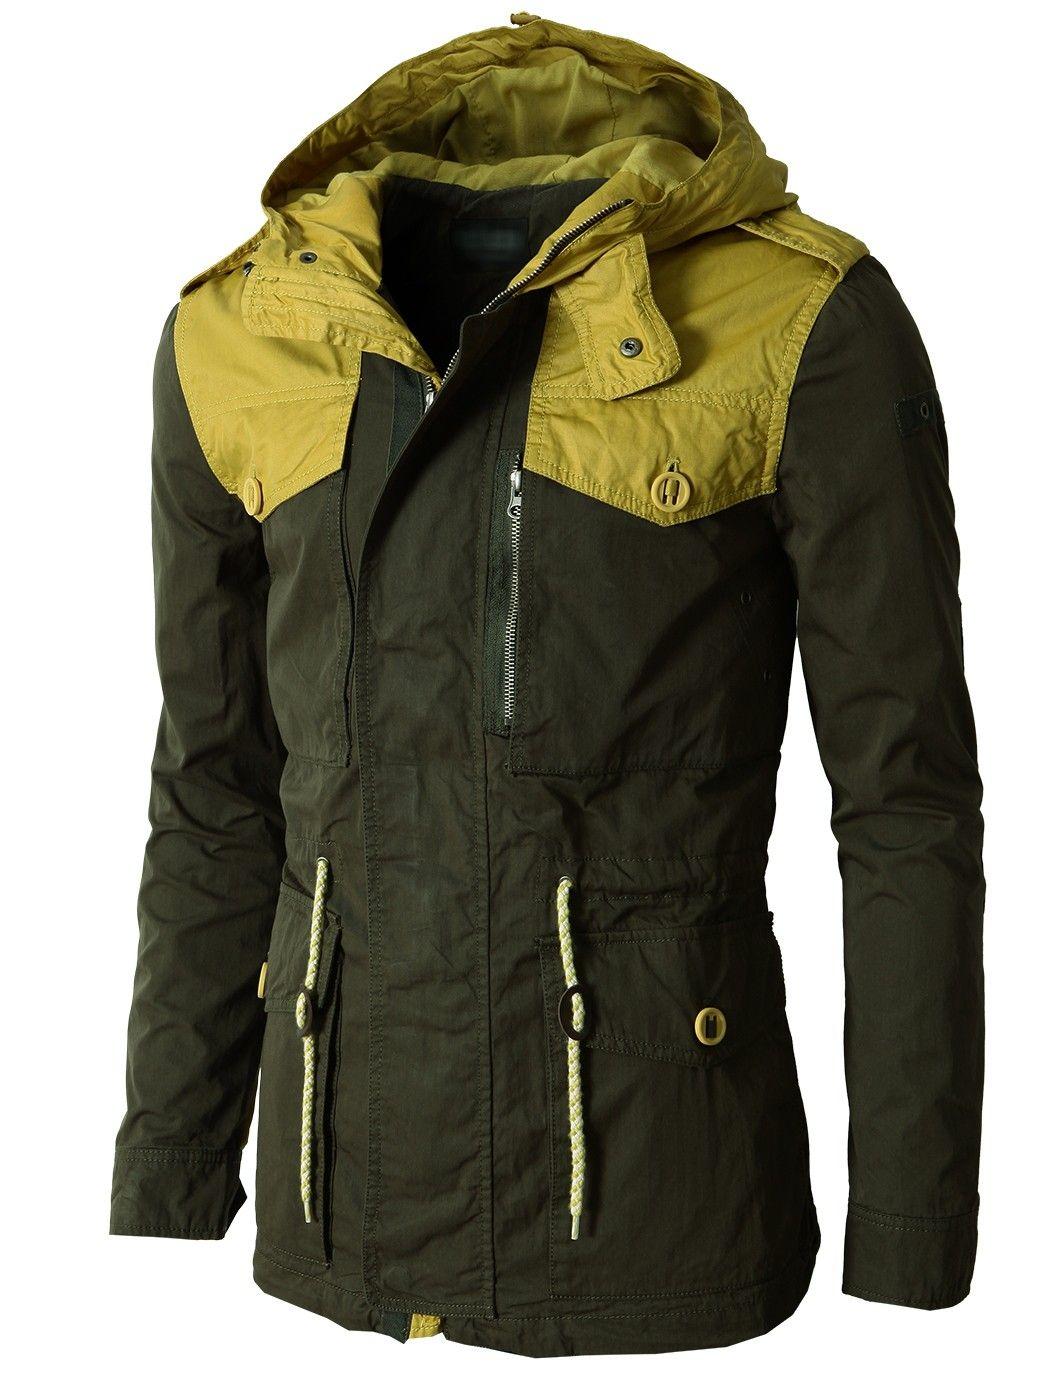 Doublju Men's Field Hoodie Jacket With Two Tone Long Sleeves (KMOJA0123) #doublju